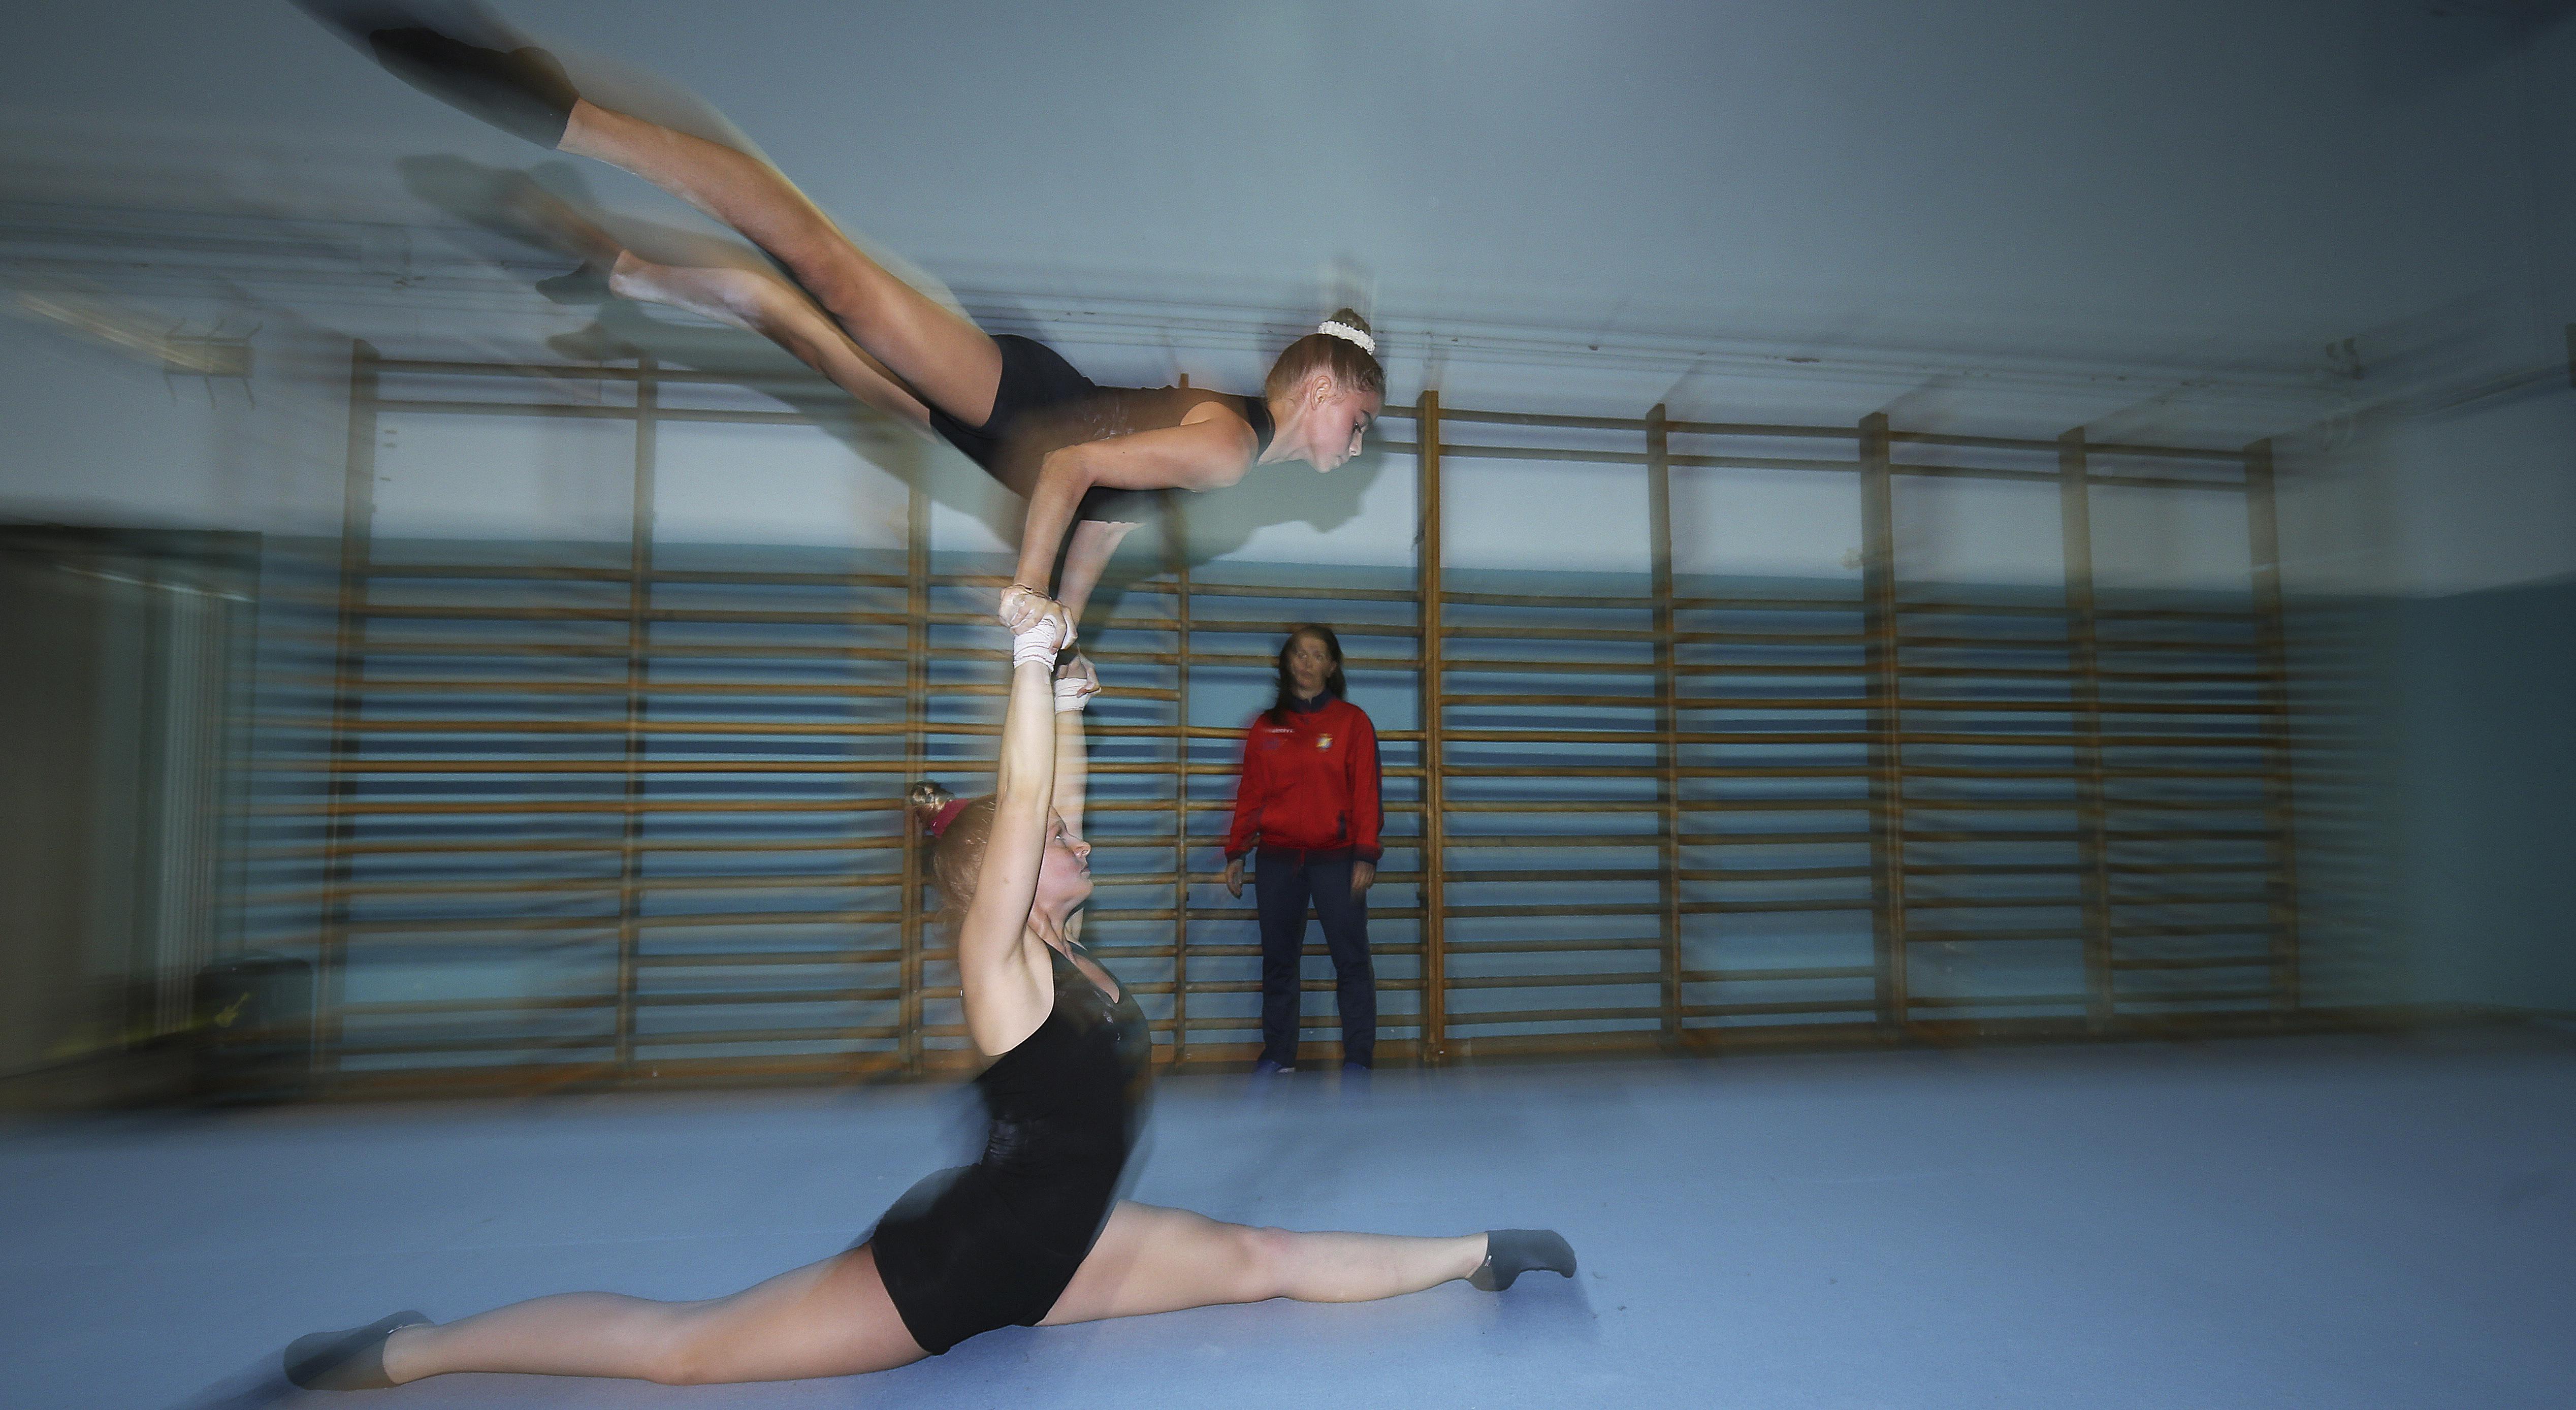 gimnasia acrobatica 4